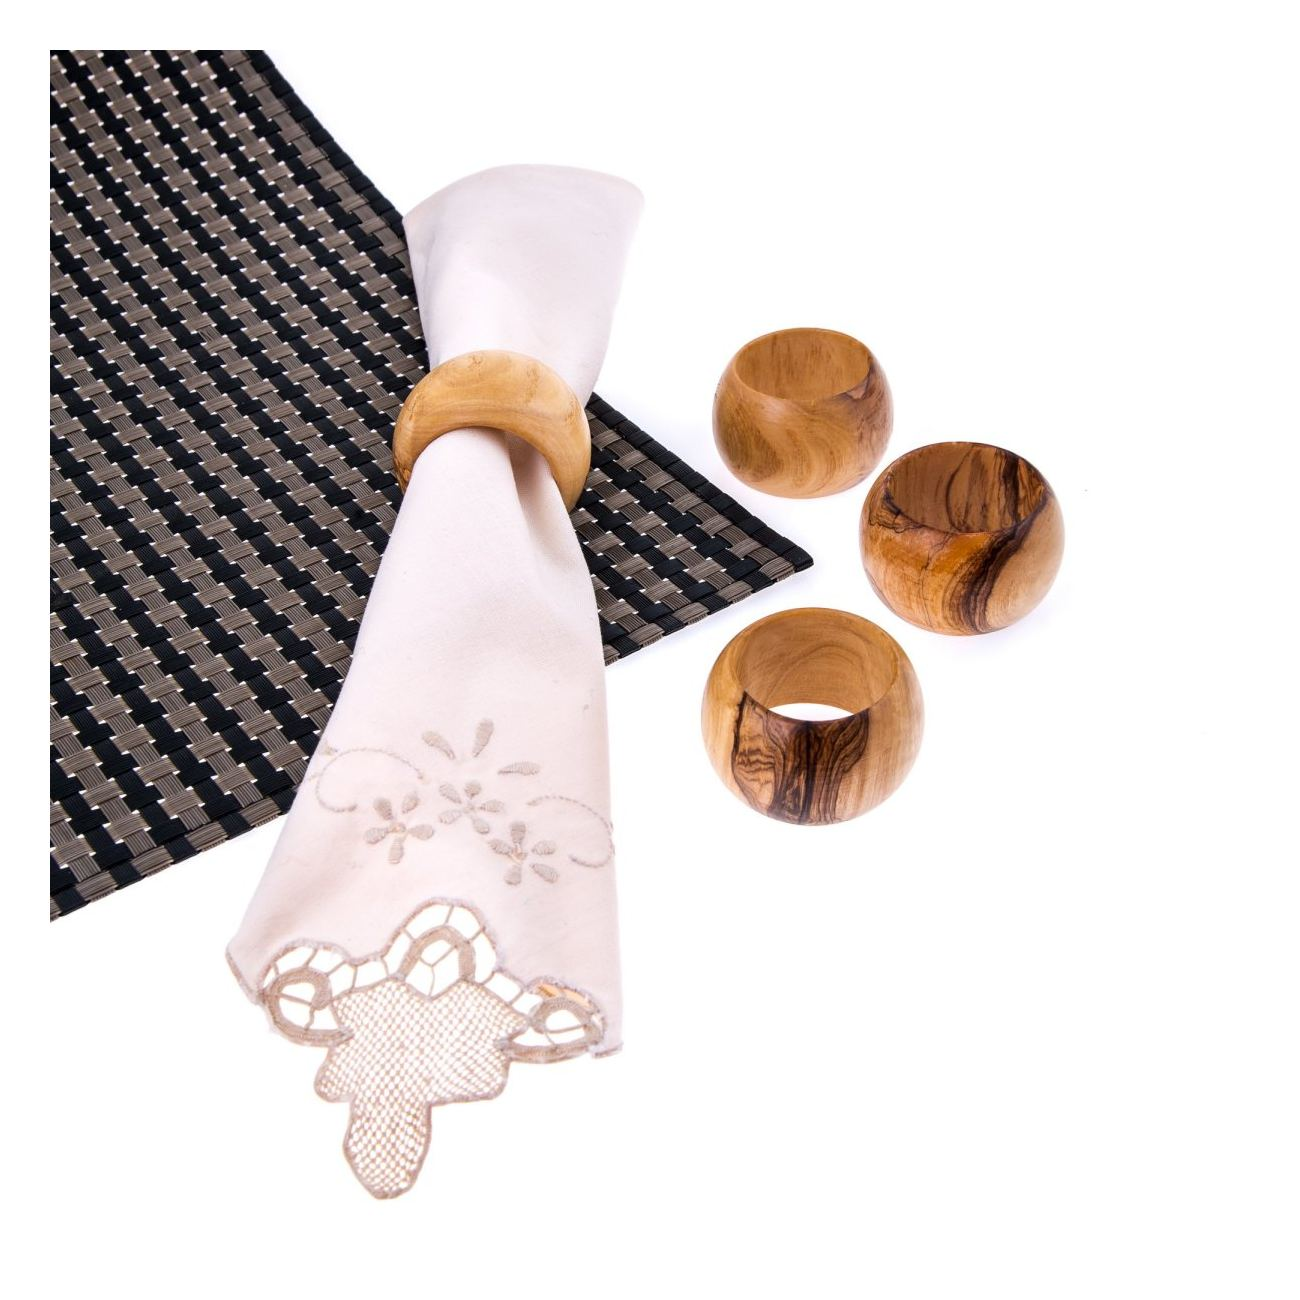 Olive Wood Napkin Rings Set Of 4 Handmade Wooden Napkin Holders